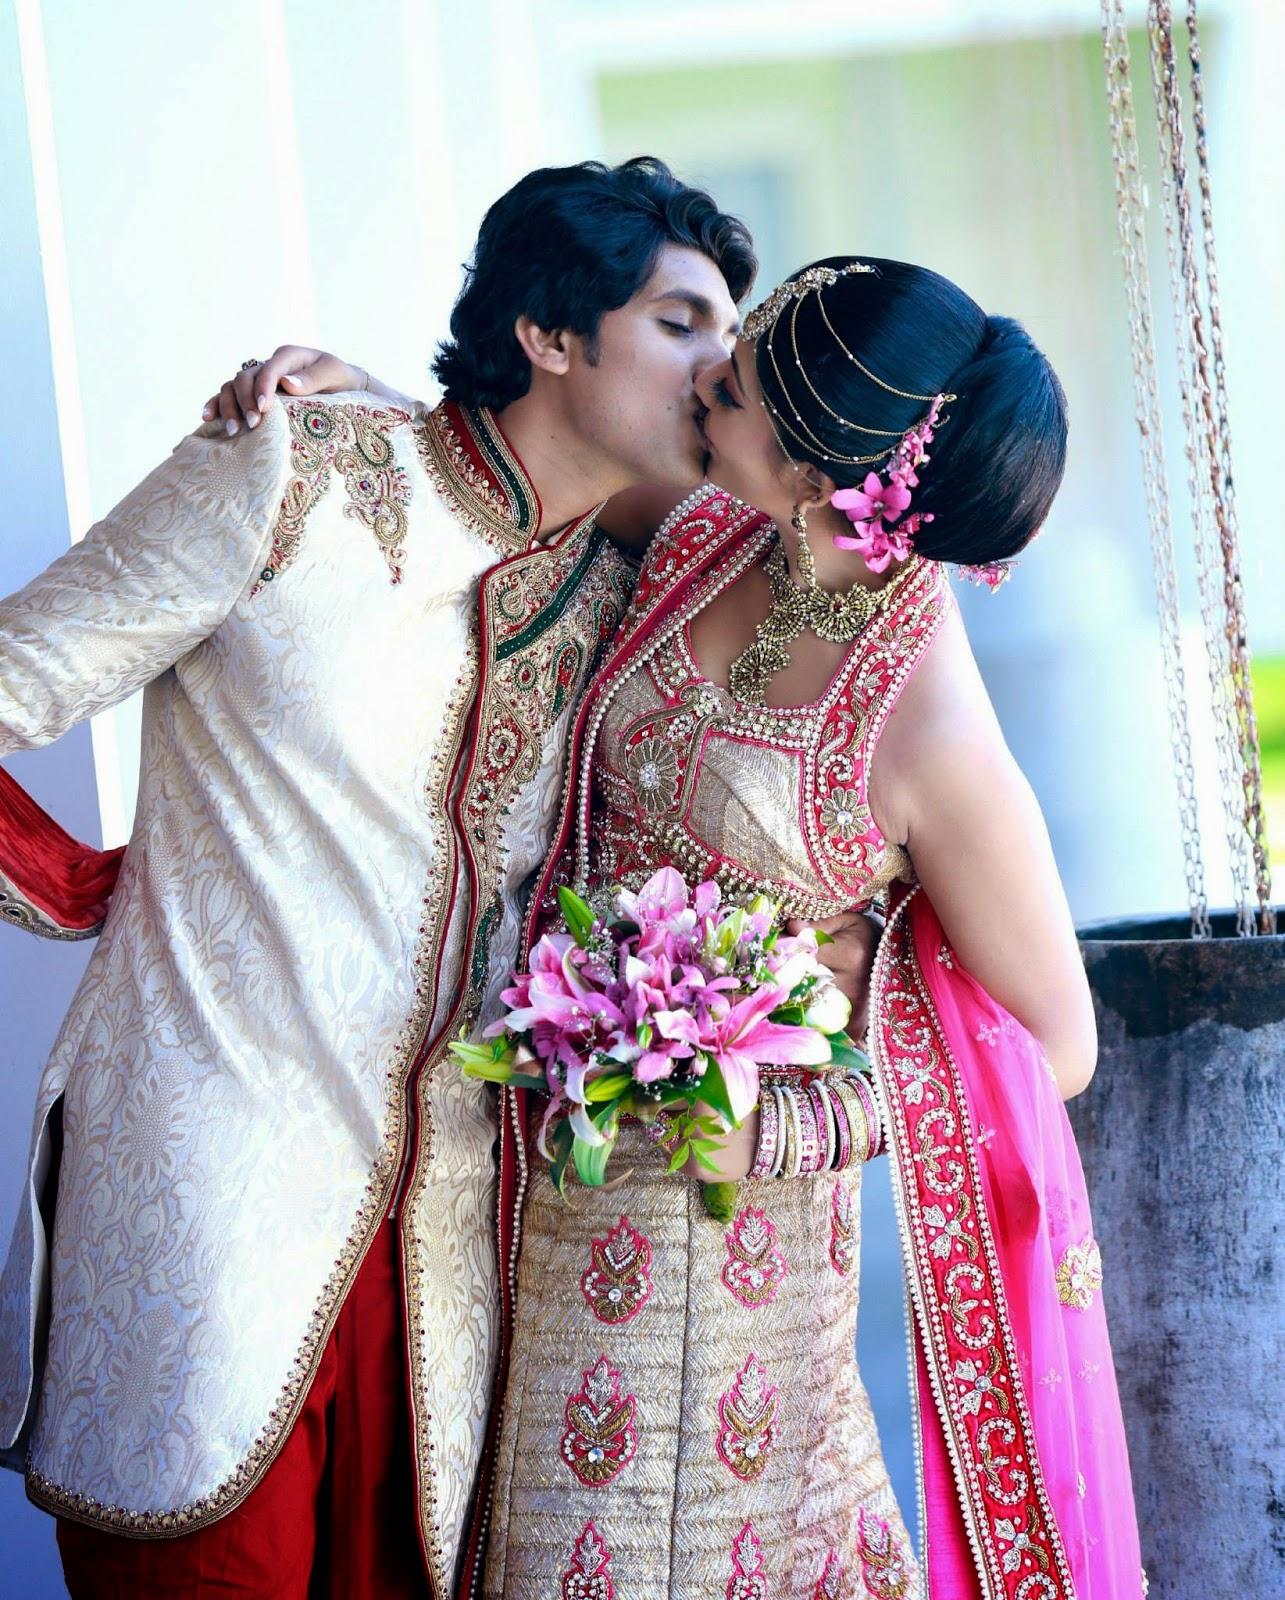 Udari Kaushalya and Sangeeth kiss